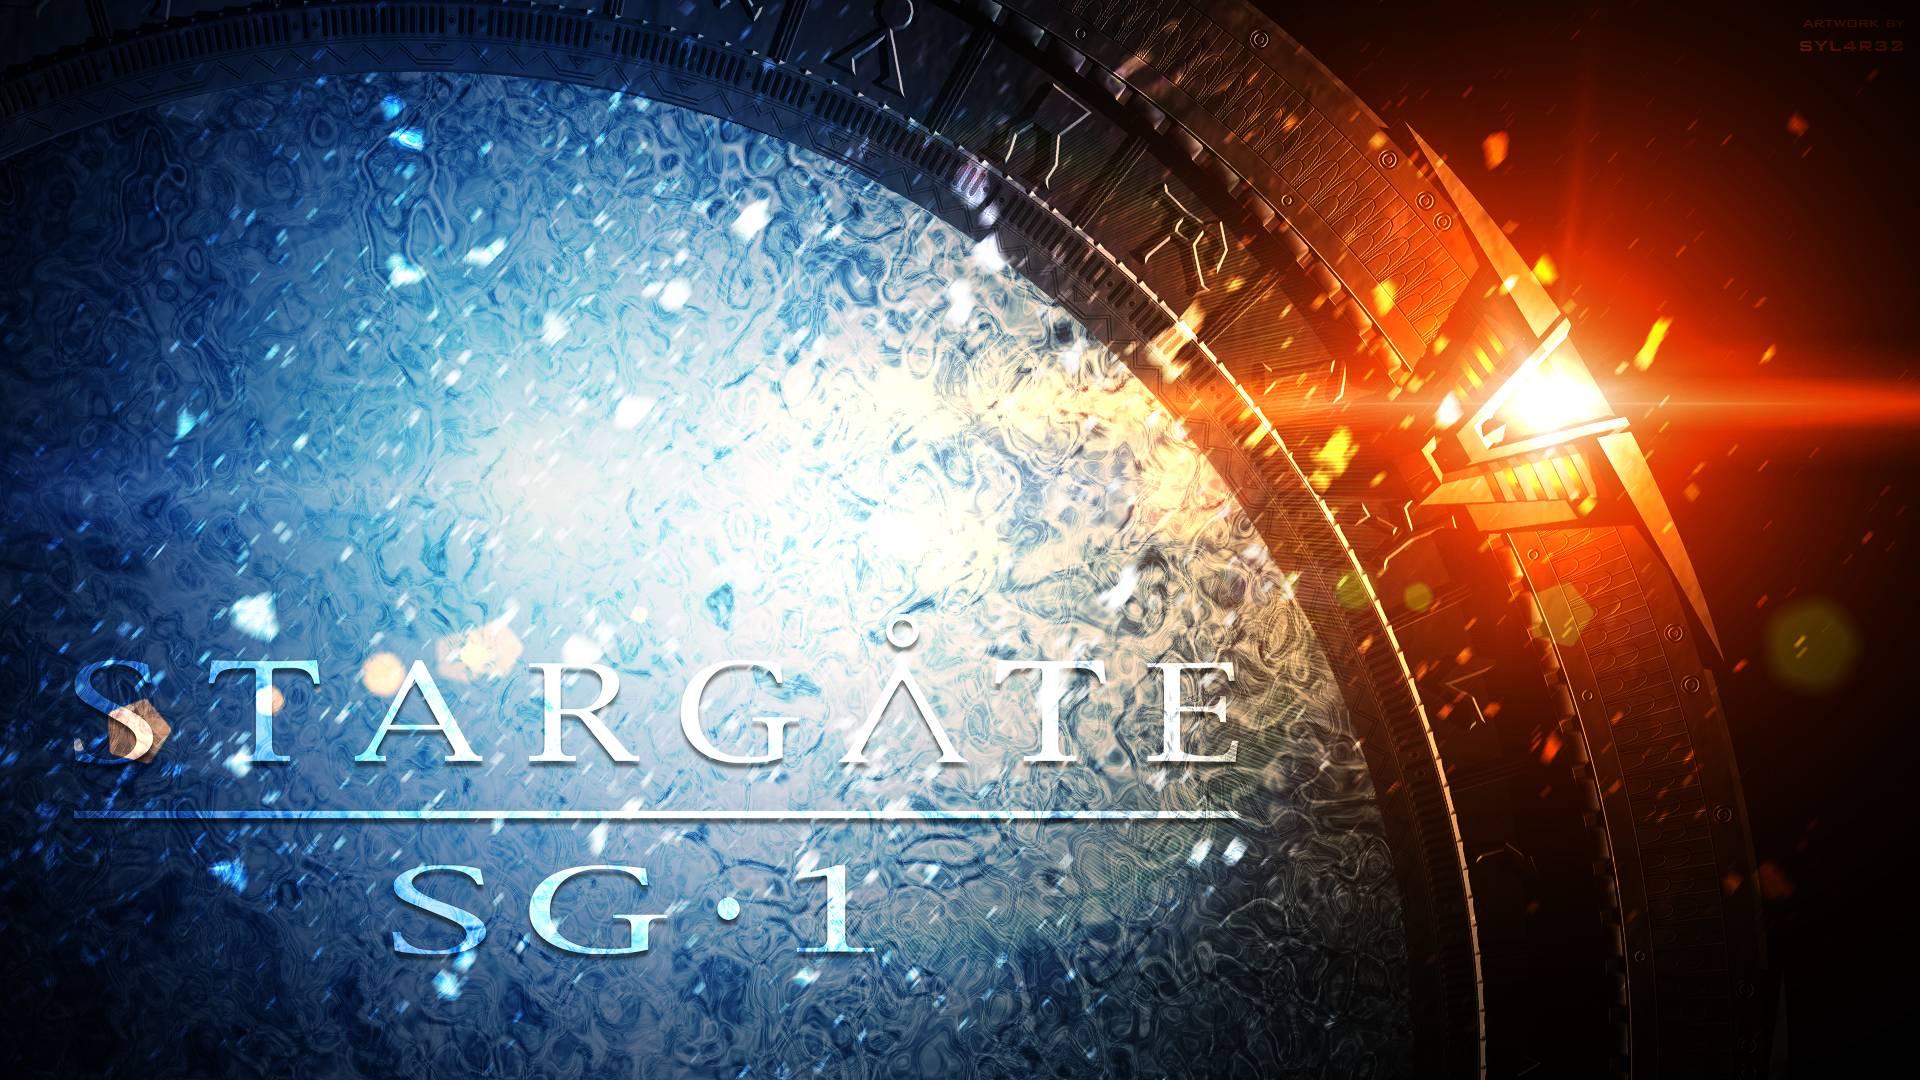 Stargate SG-1 HD Wallpaper   Background Image   1920x1080